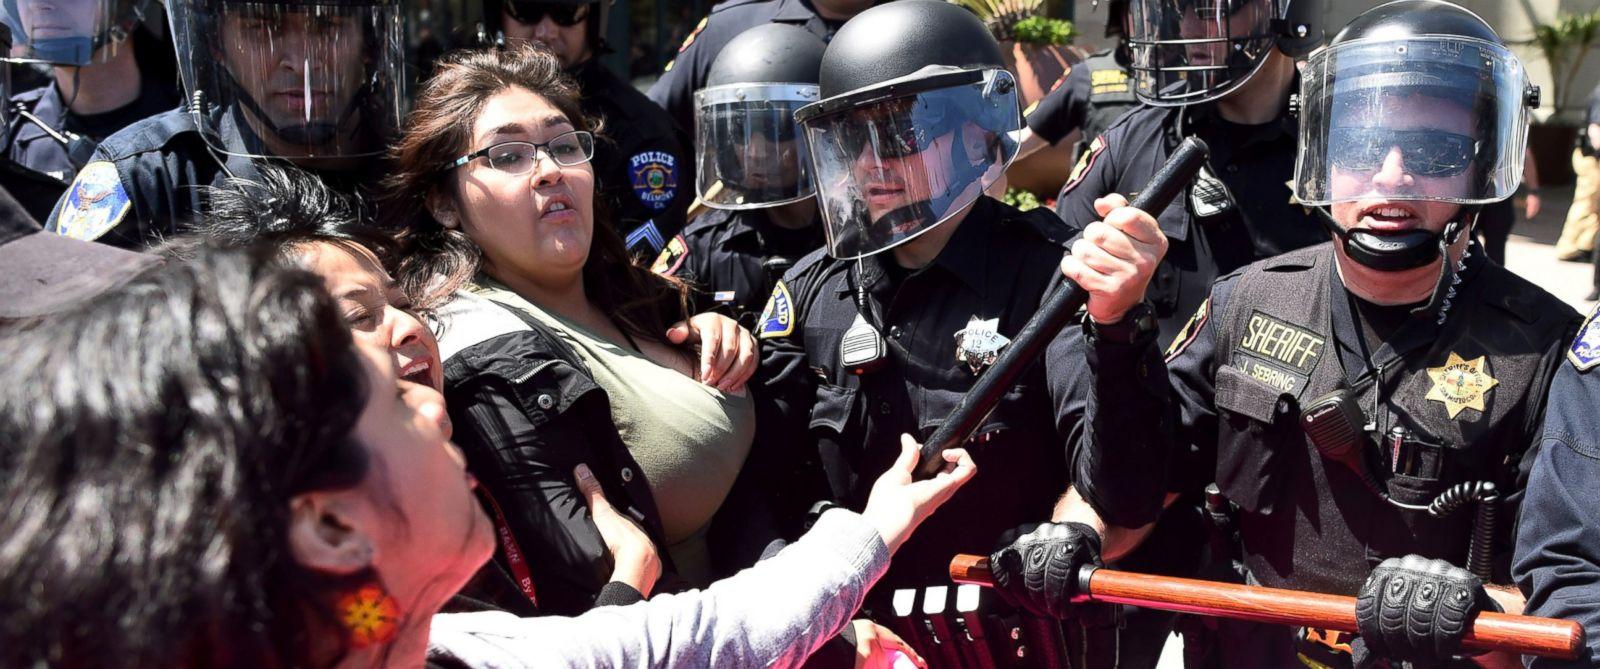 PHOTO: Police in riot gear hold back demonstrators protesting Donald Trump outside the Hyatt hotel in Burlingame, Calif., April 29, 2016.